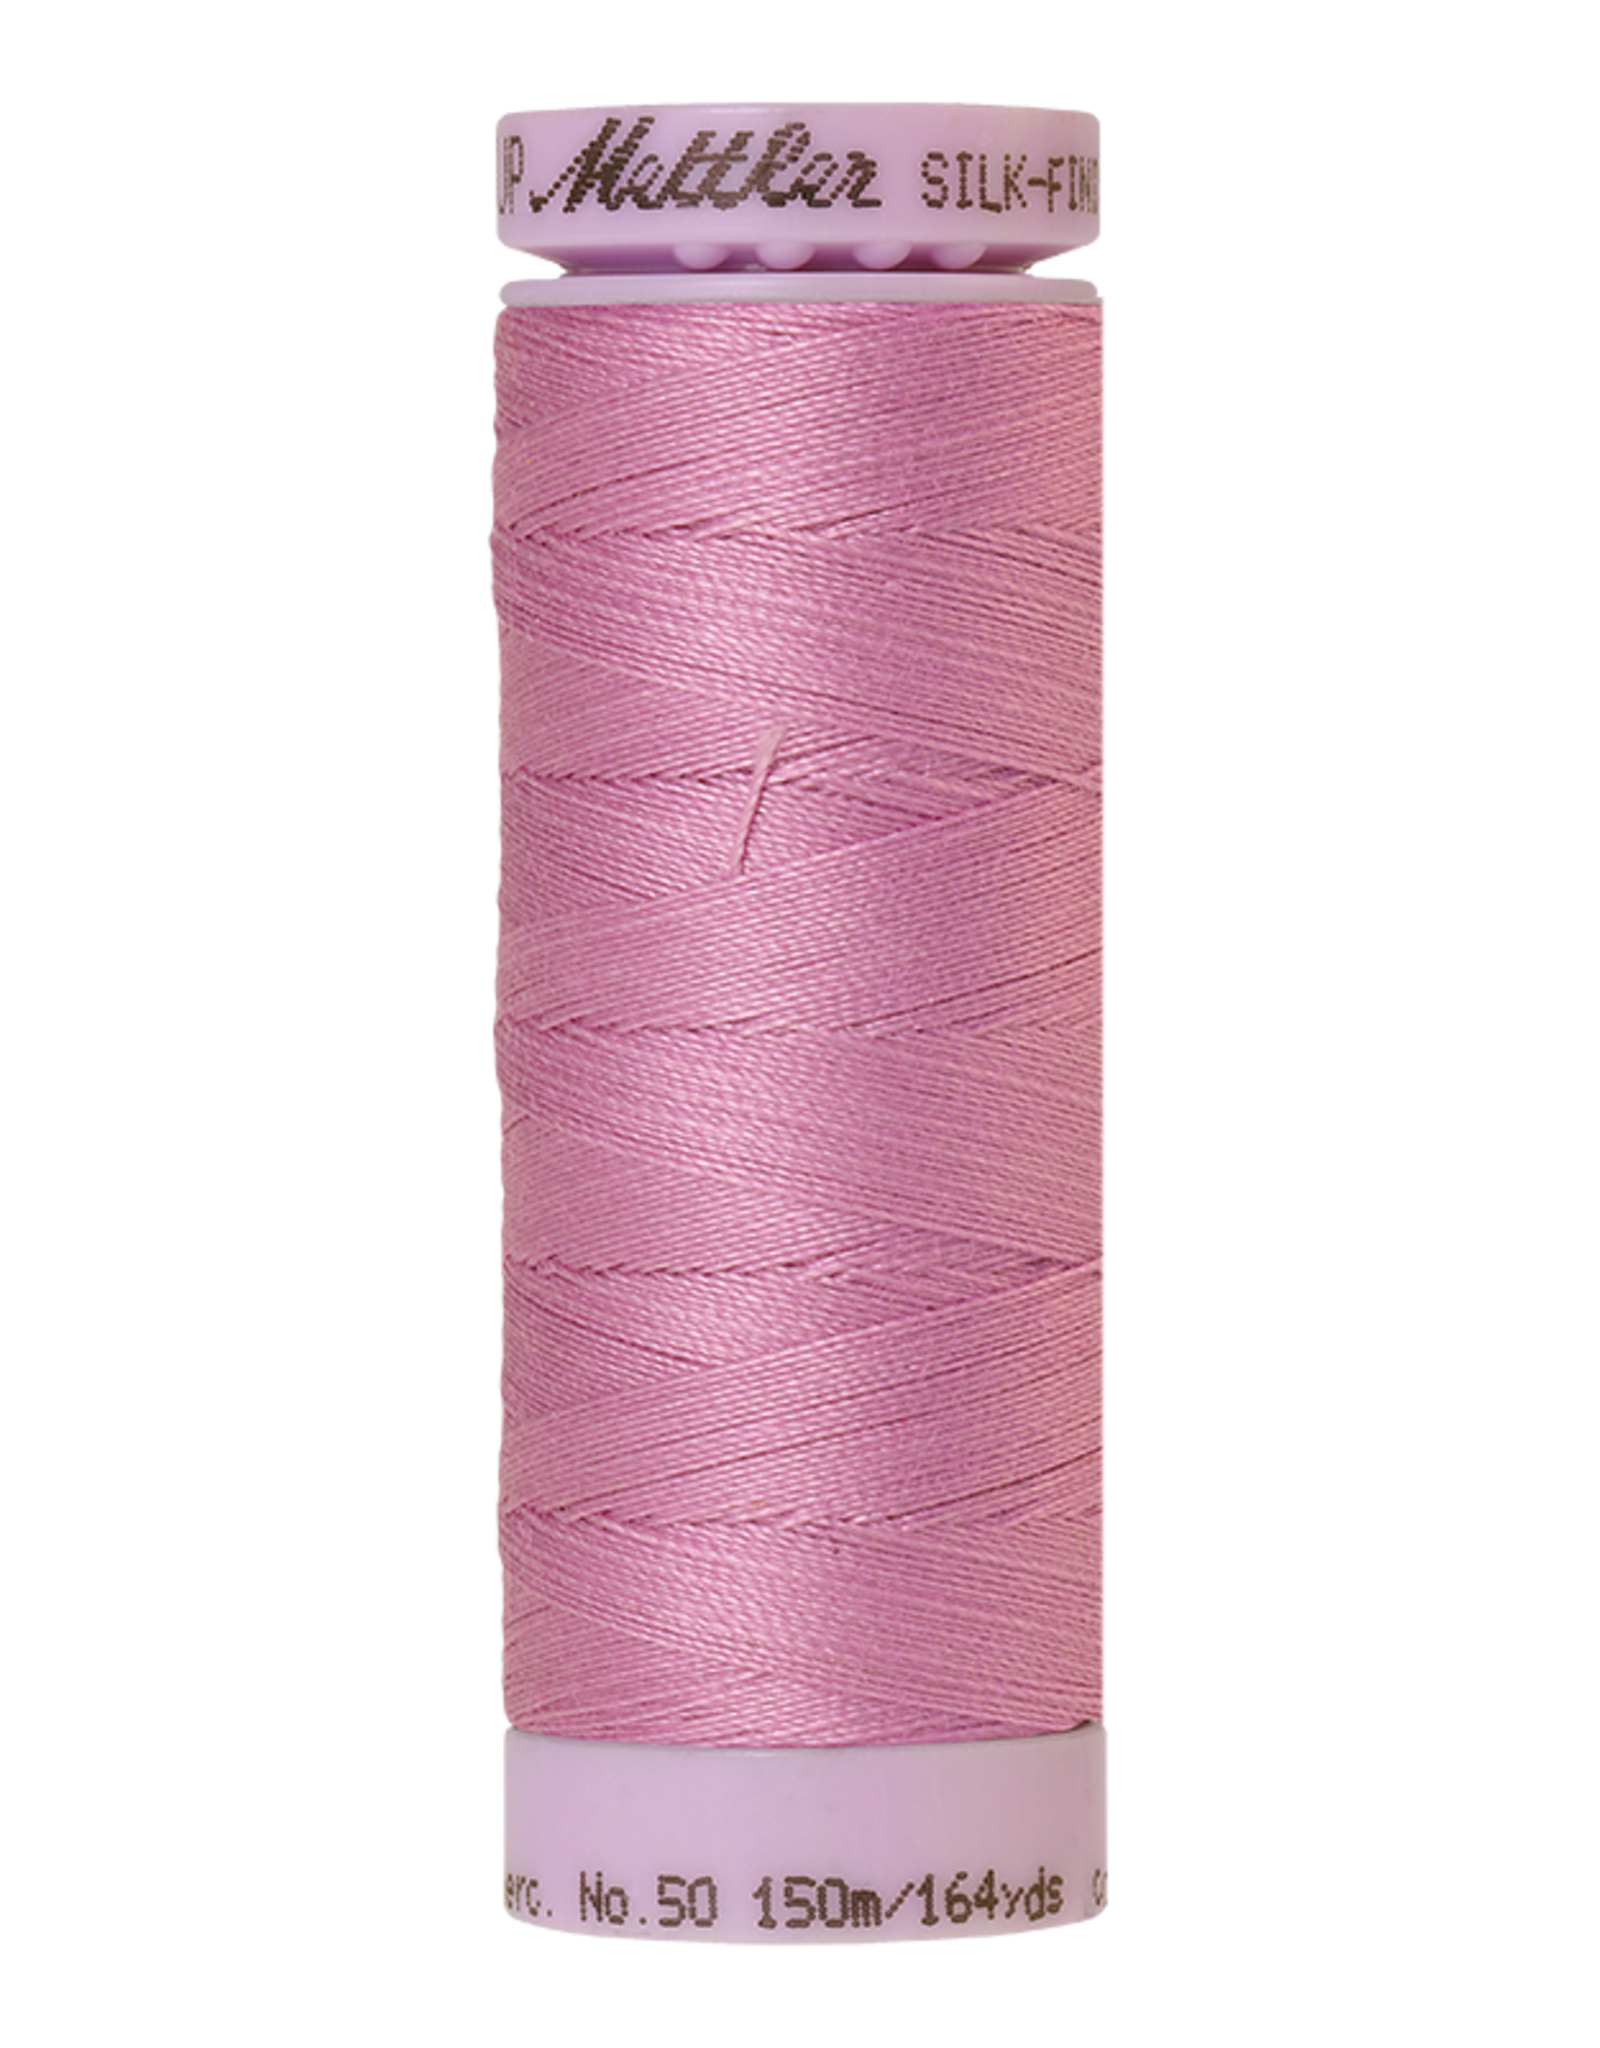 Mettler Silk Finish Cotton 50 - 150 meter - 1523